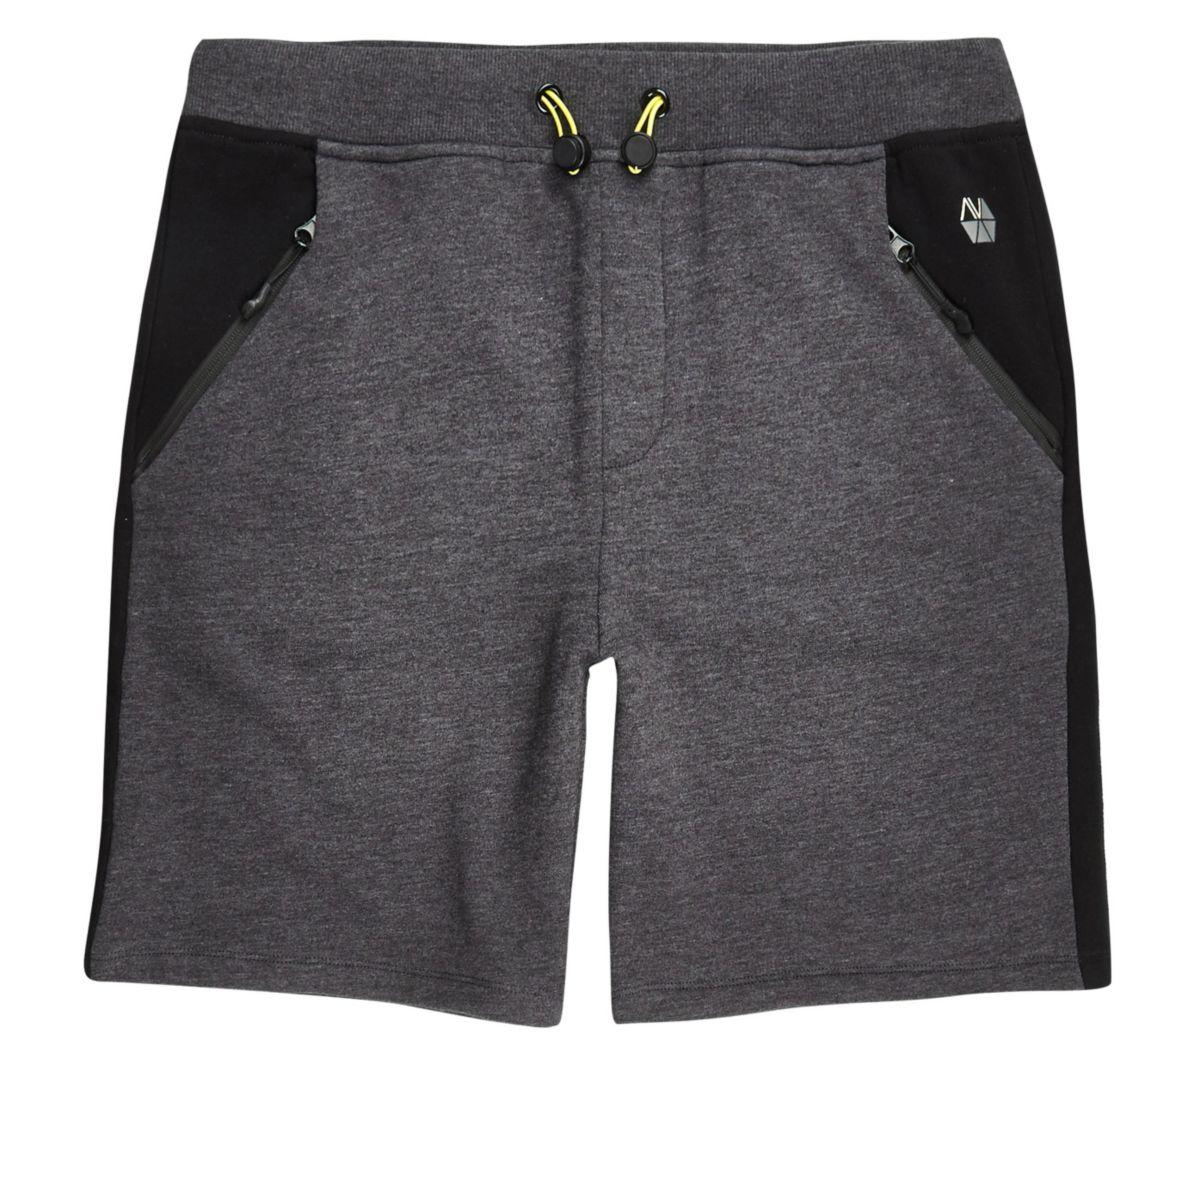 RI Active grey panel sports sweat shorts